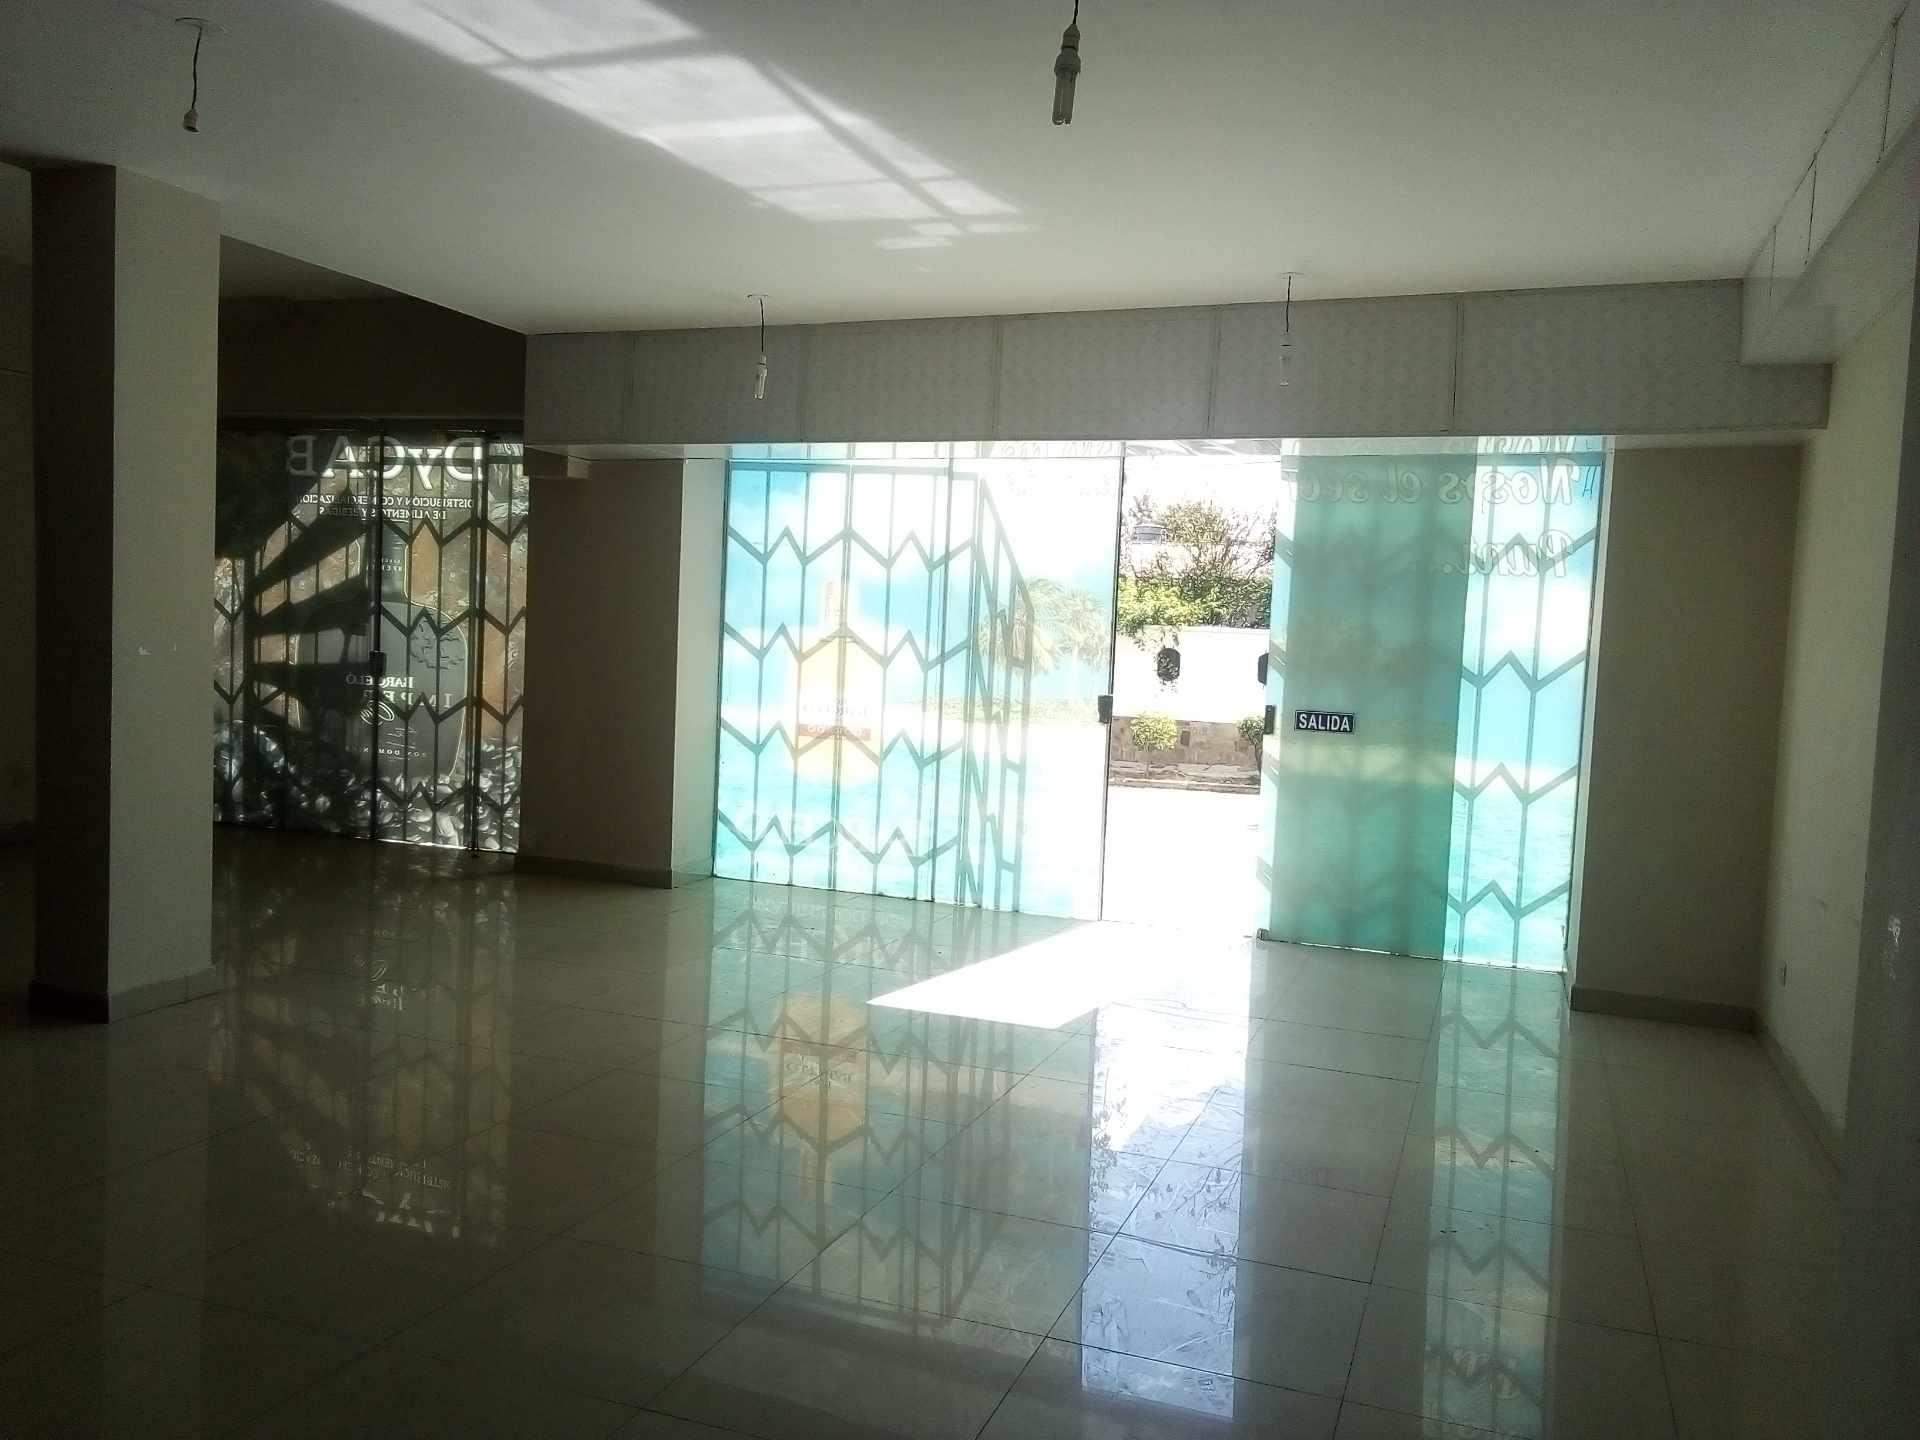 Local comercial en Alquiler $us. 450.- LOCAL COMERCIAL + MEZZANINE PROX. CALA CALA Foto 2